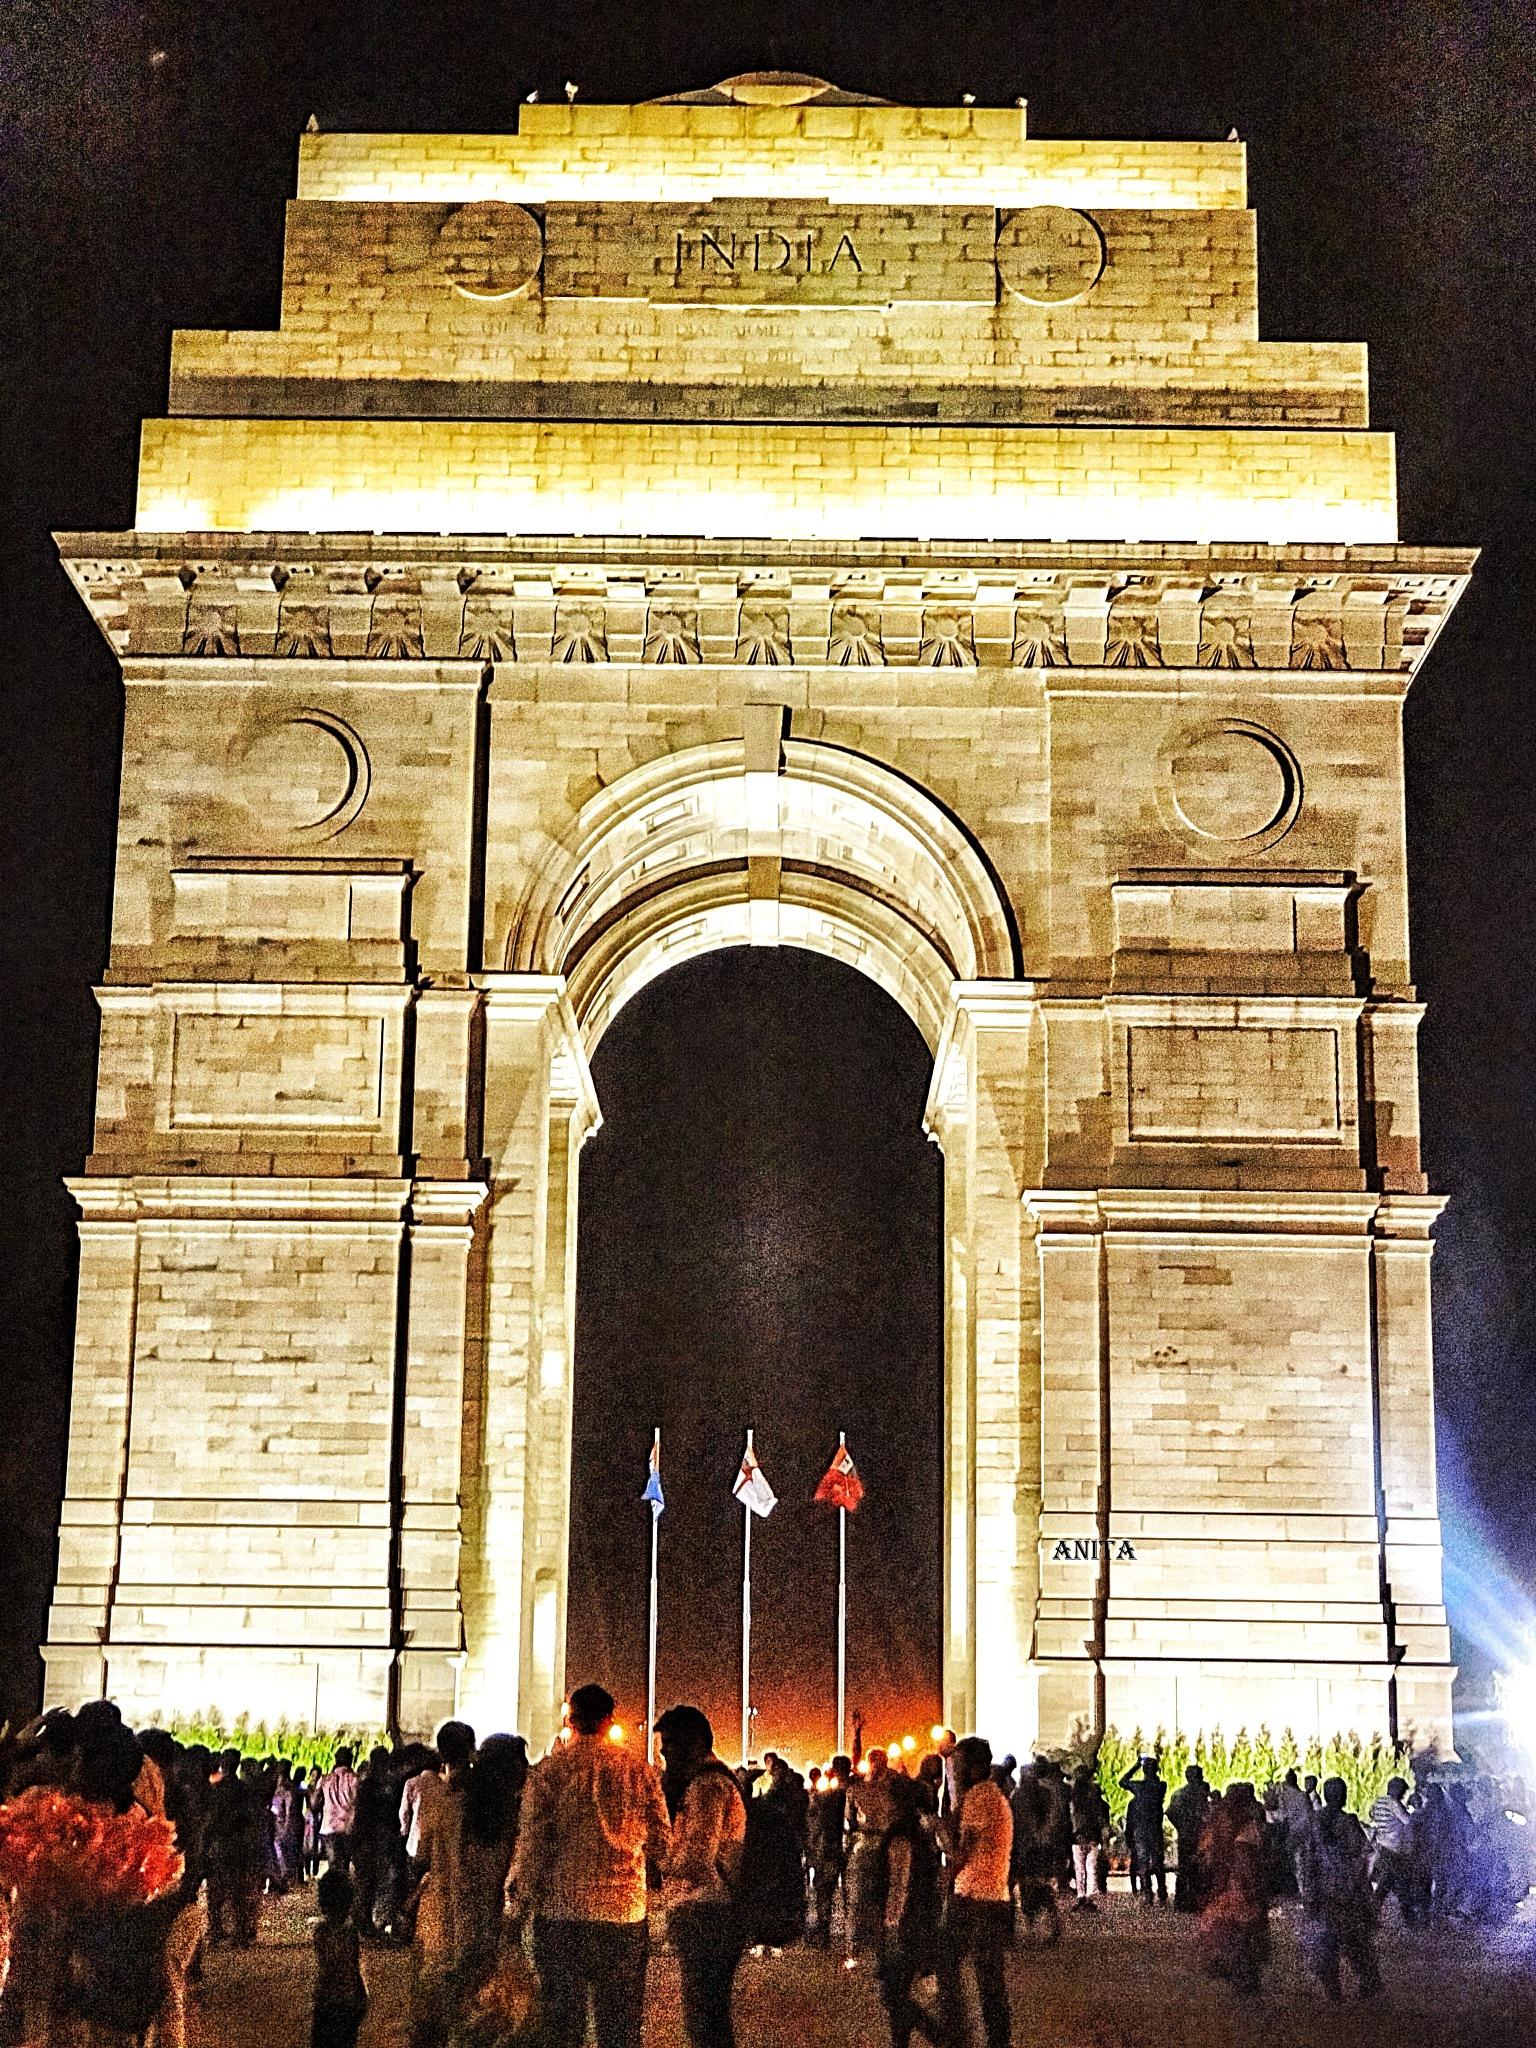 INDIA GATE  by Anita Solanki